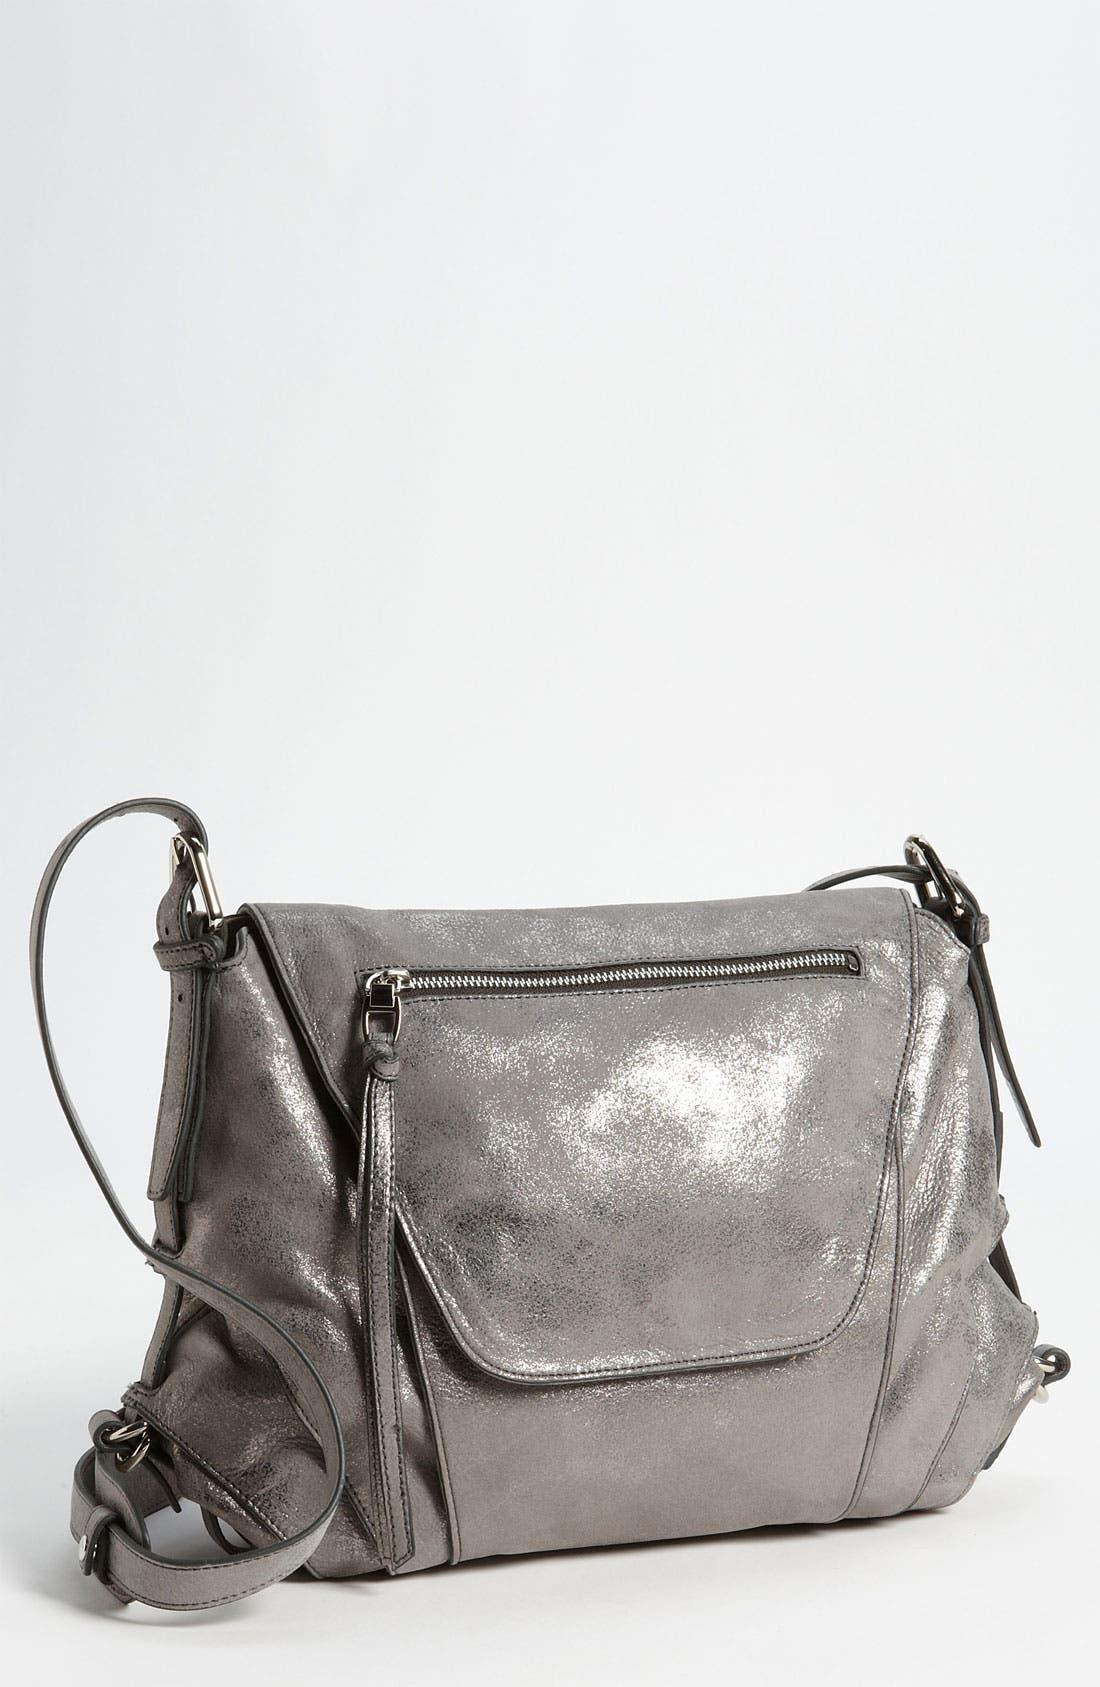 Main Image - Kooba 'Brielle' Glitter Leather Crossbody Bag